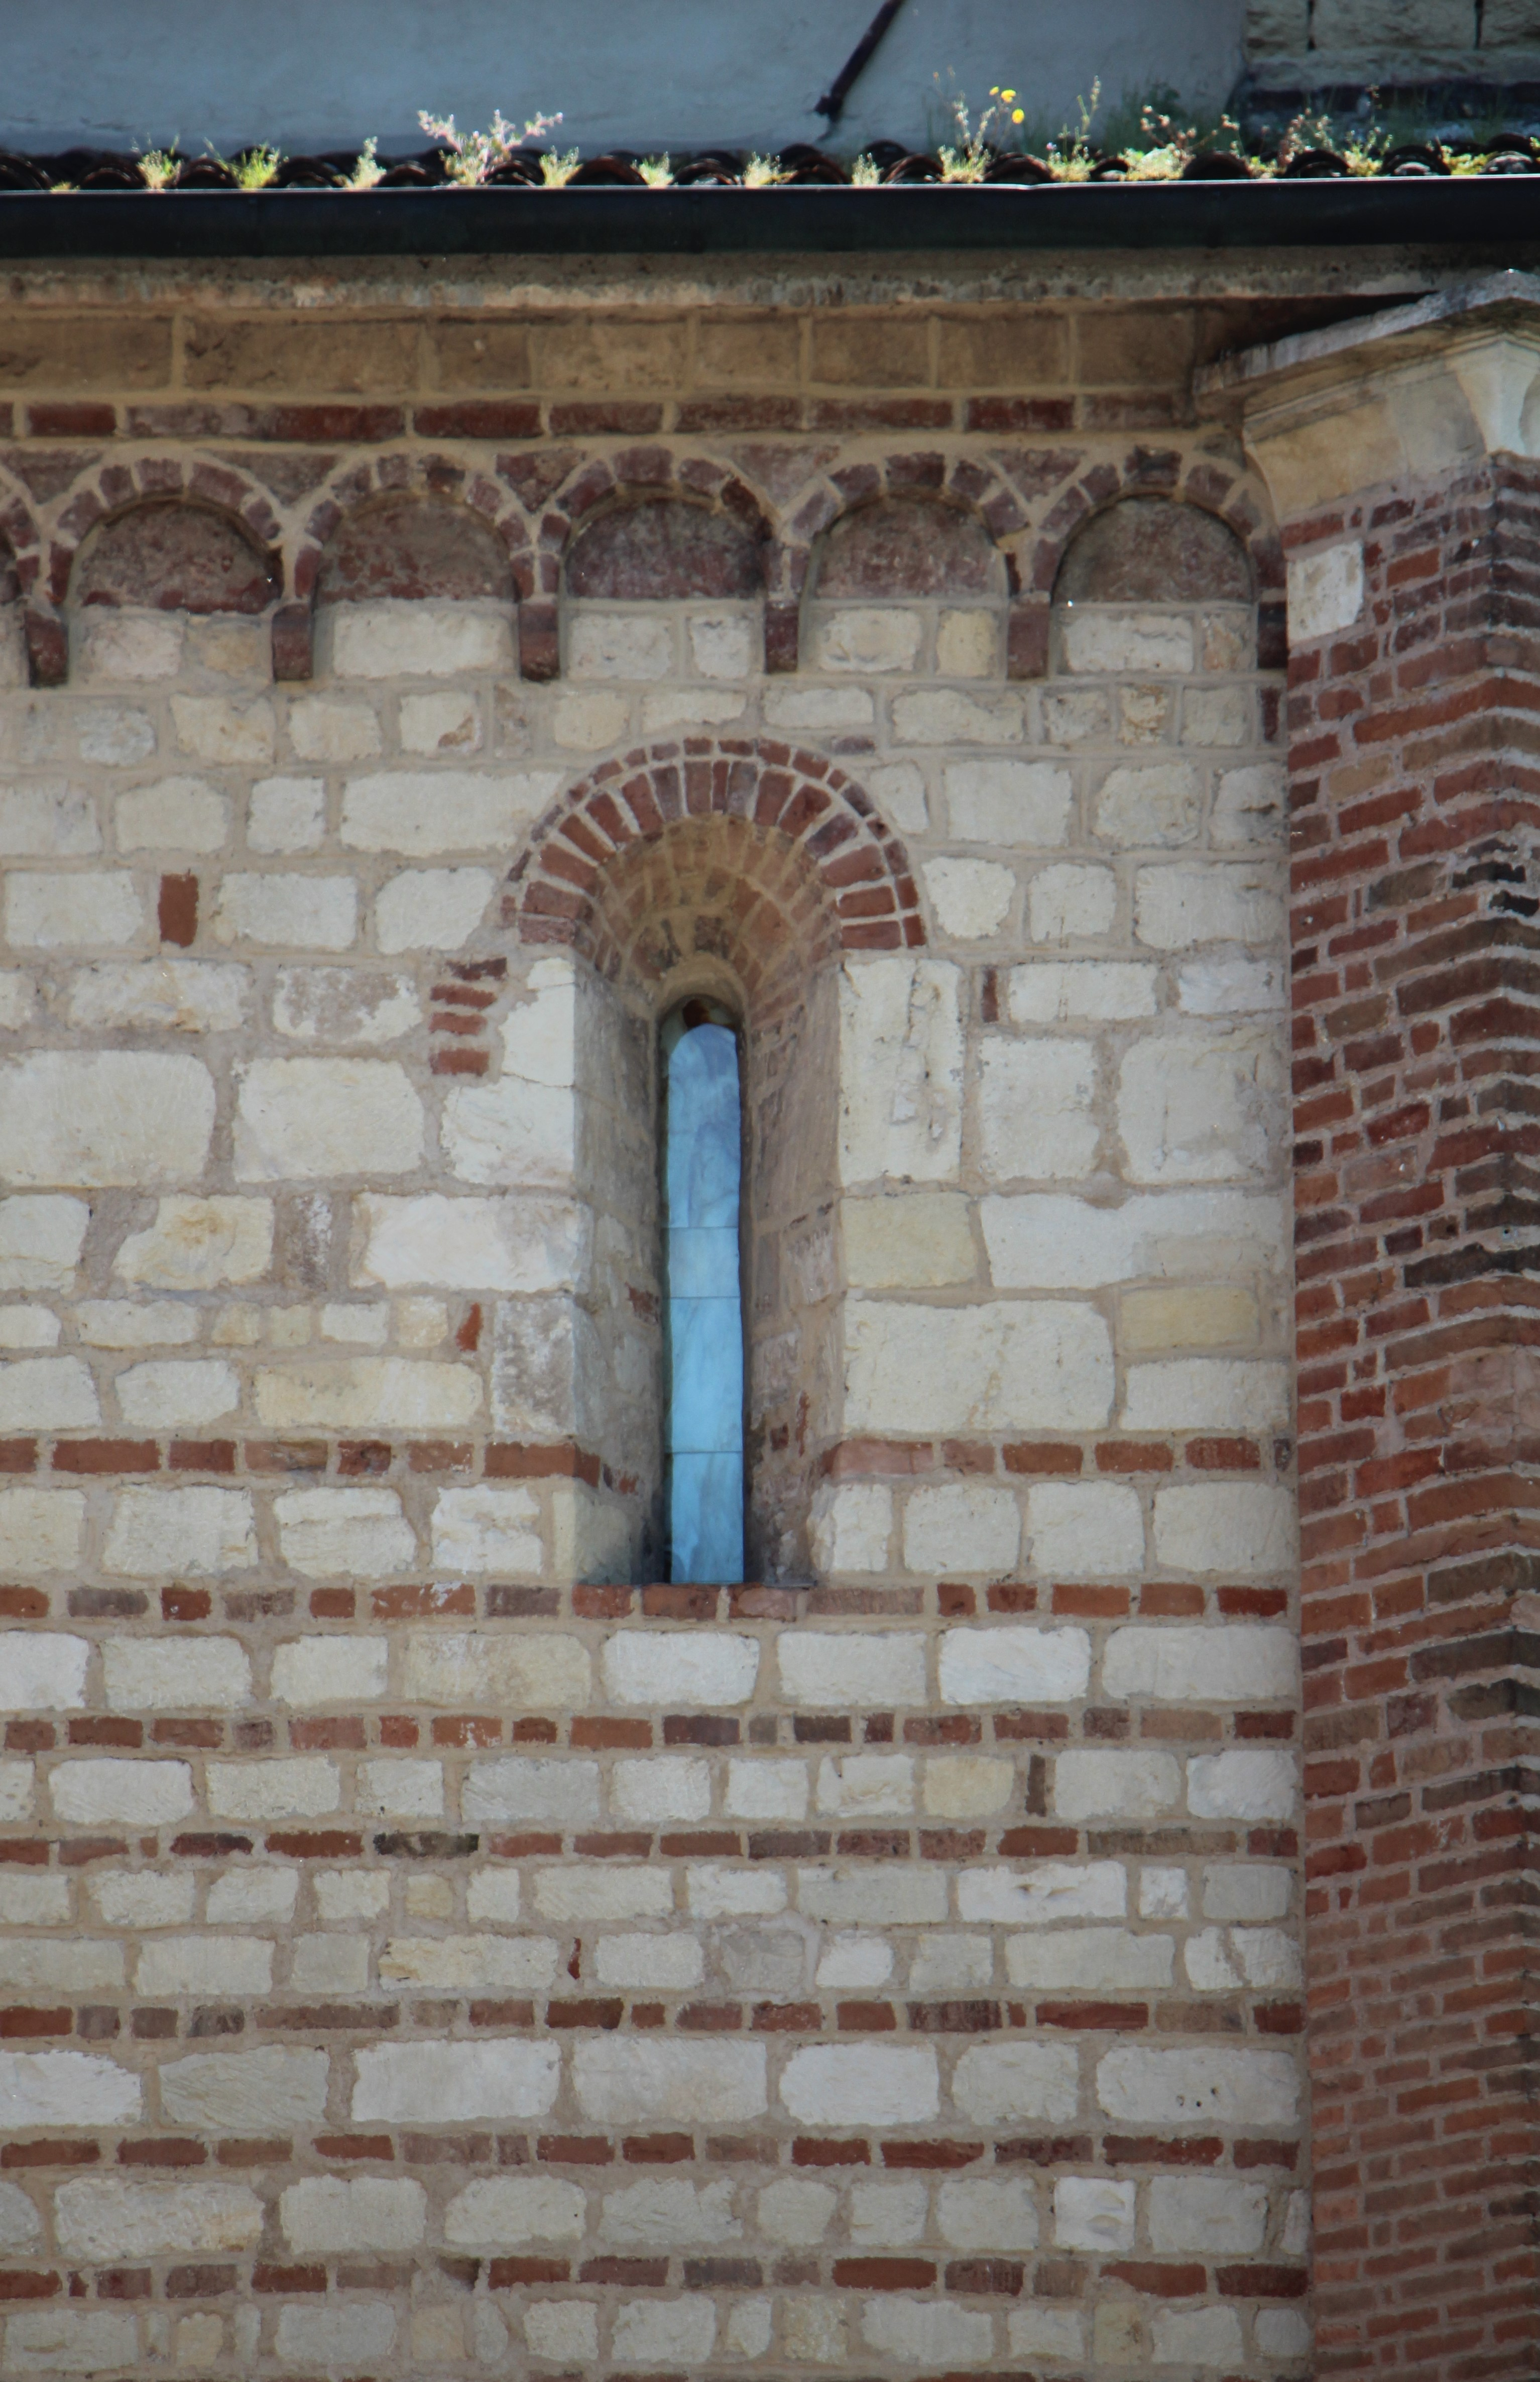 Chiesa di San Lorenzo (basilica, rettoriale) - Verona (VR)